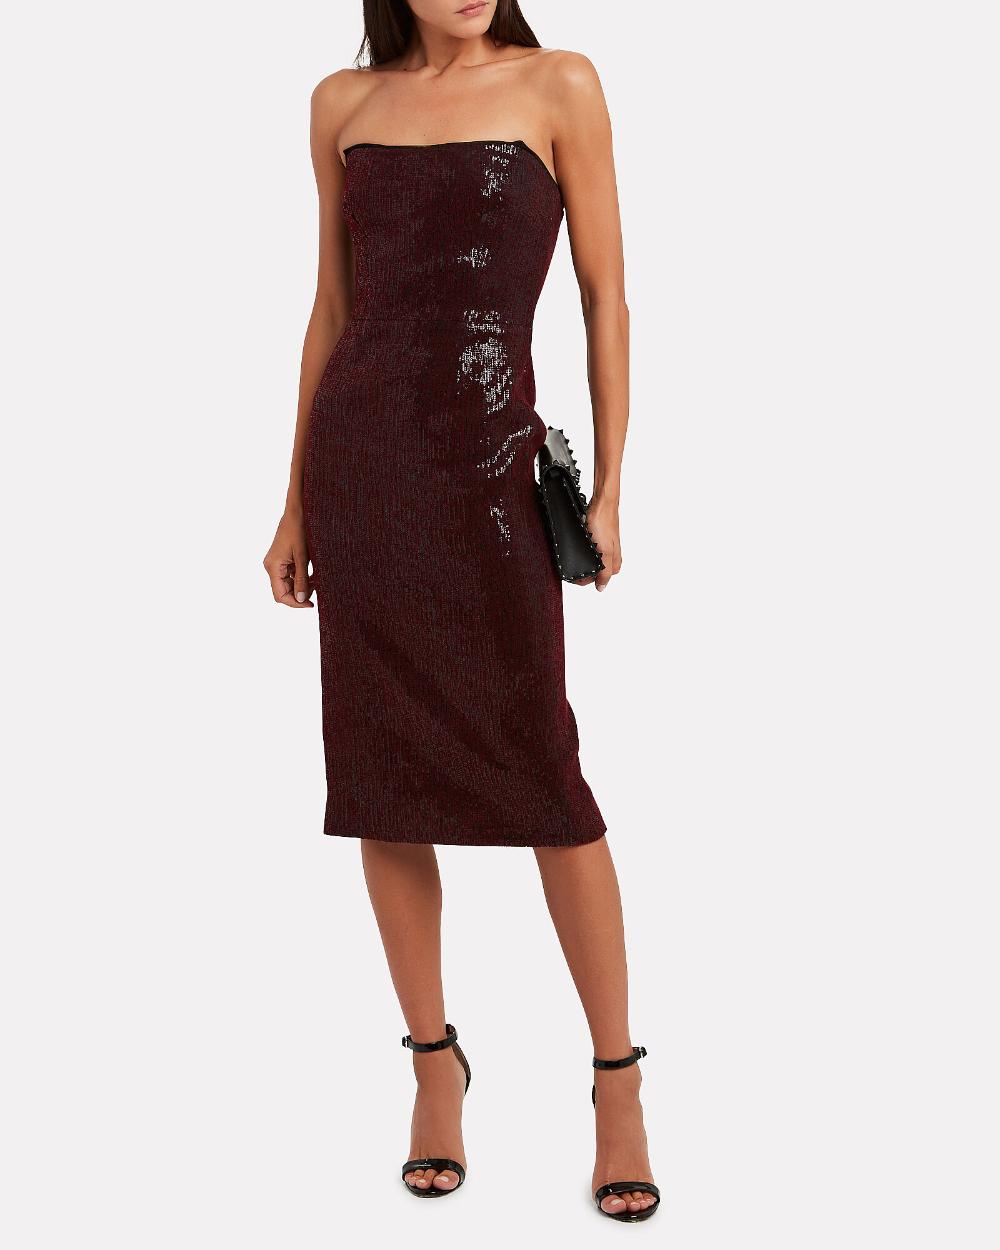 Martina Strapless Sequin Dress Dresses Strapless Sequin Dress Sequin Dress [ 1250 x 1000 Pixel ]